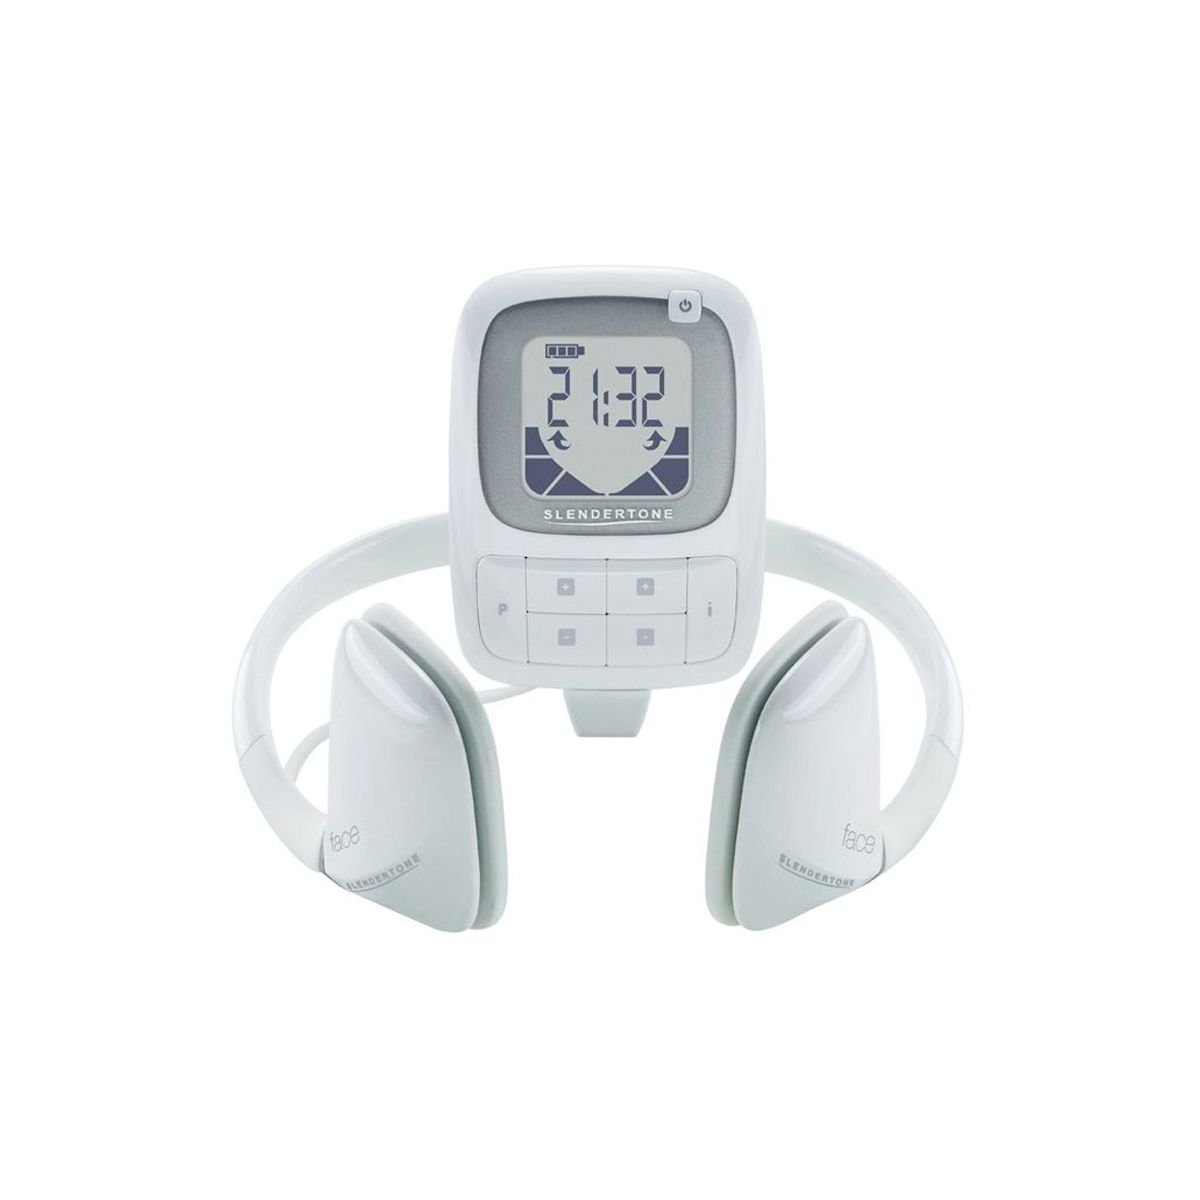 Electro-stimulation slendertone face 2 - livraison offerte : code livpremium